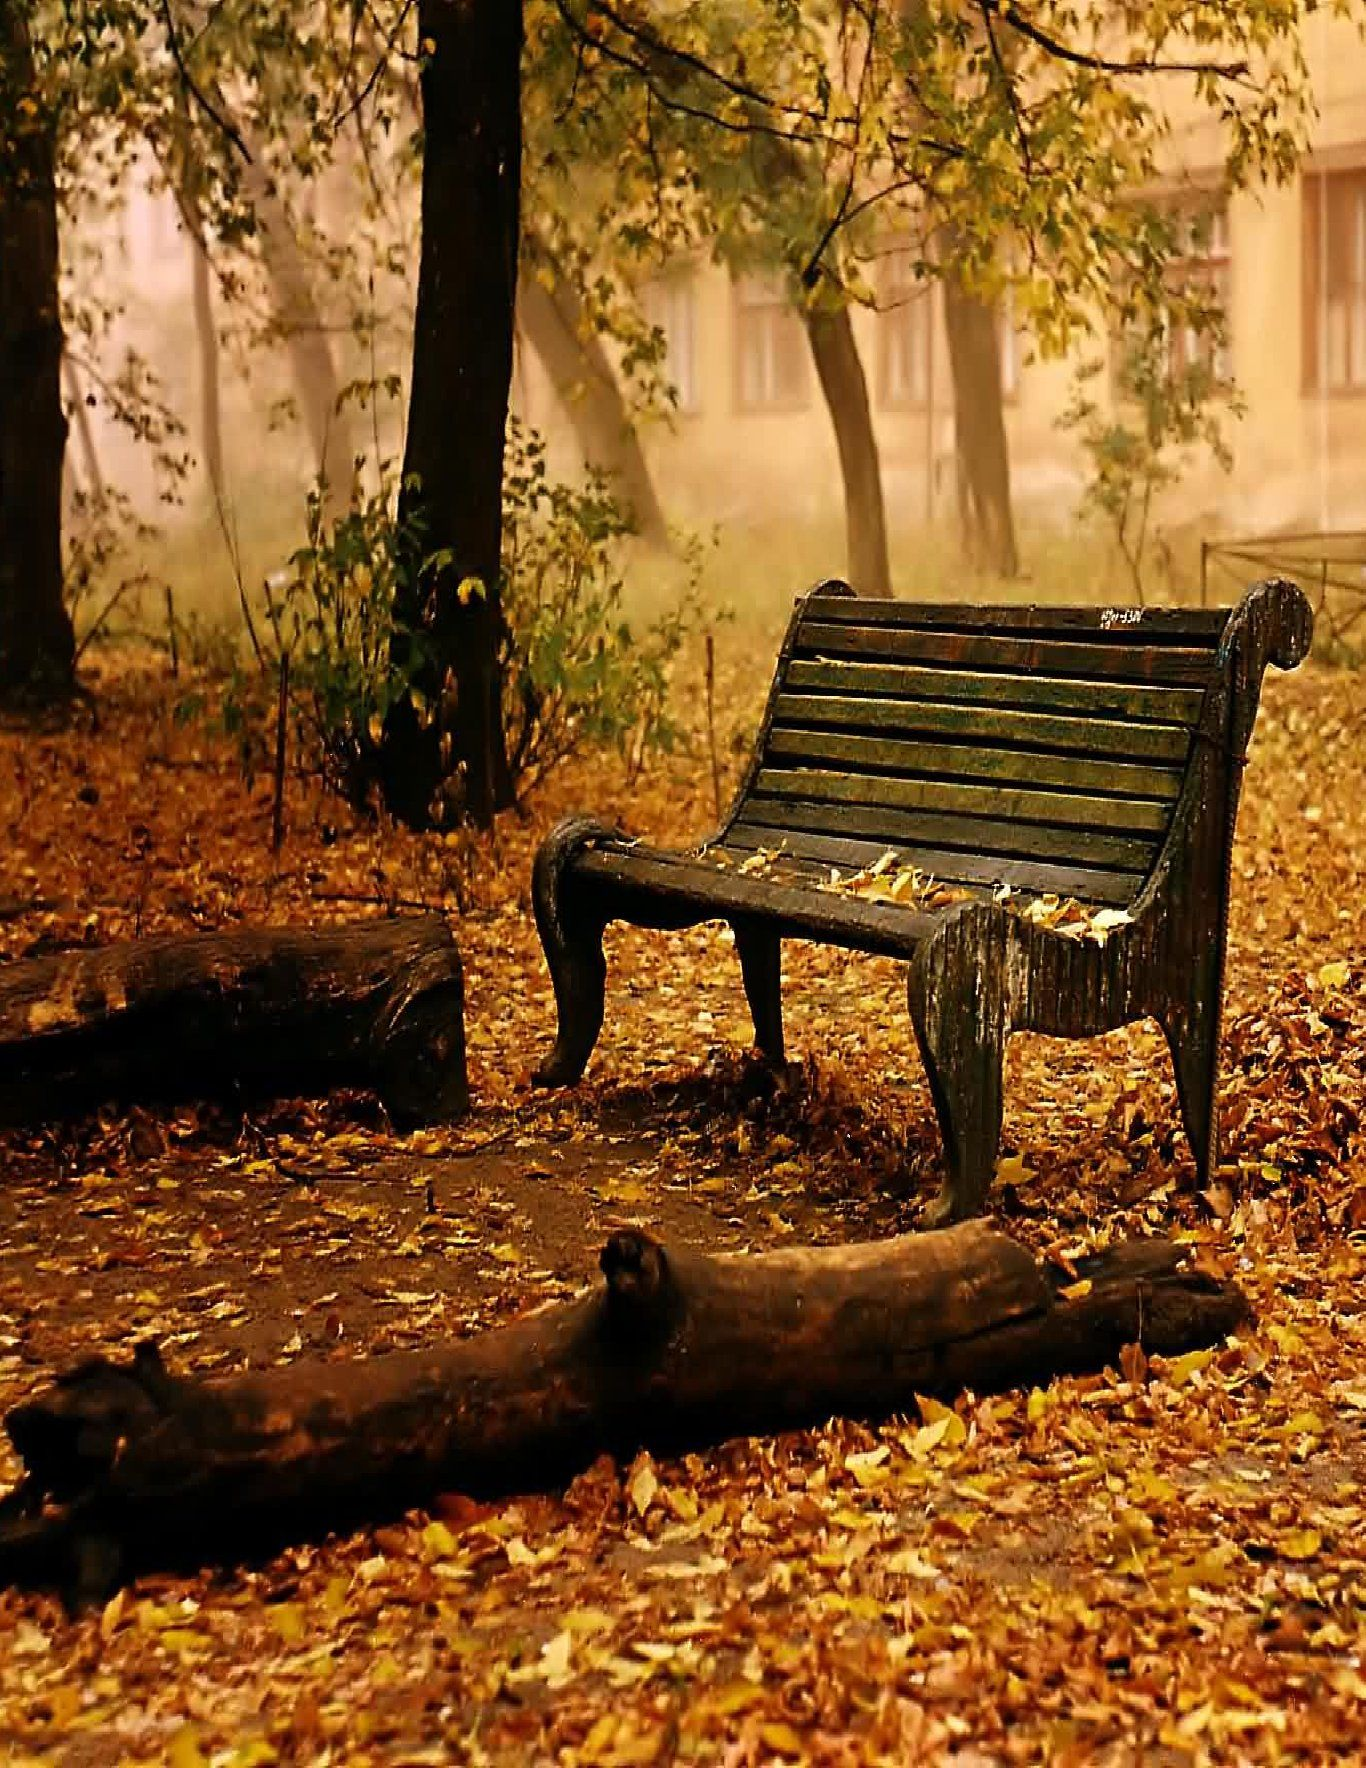 park bench | Benches | Pinterest | Muebles de exterior, Bancos y Otoño